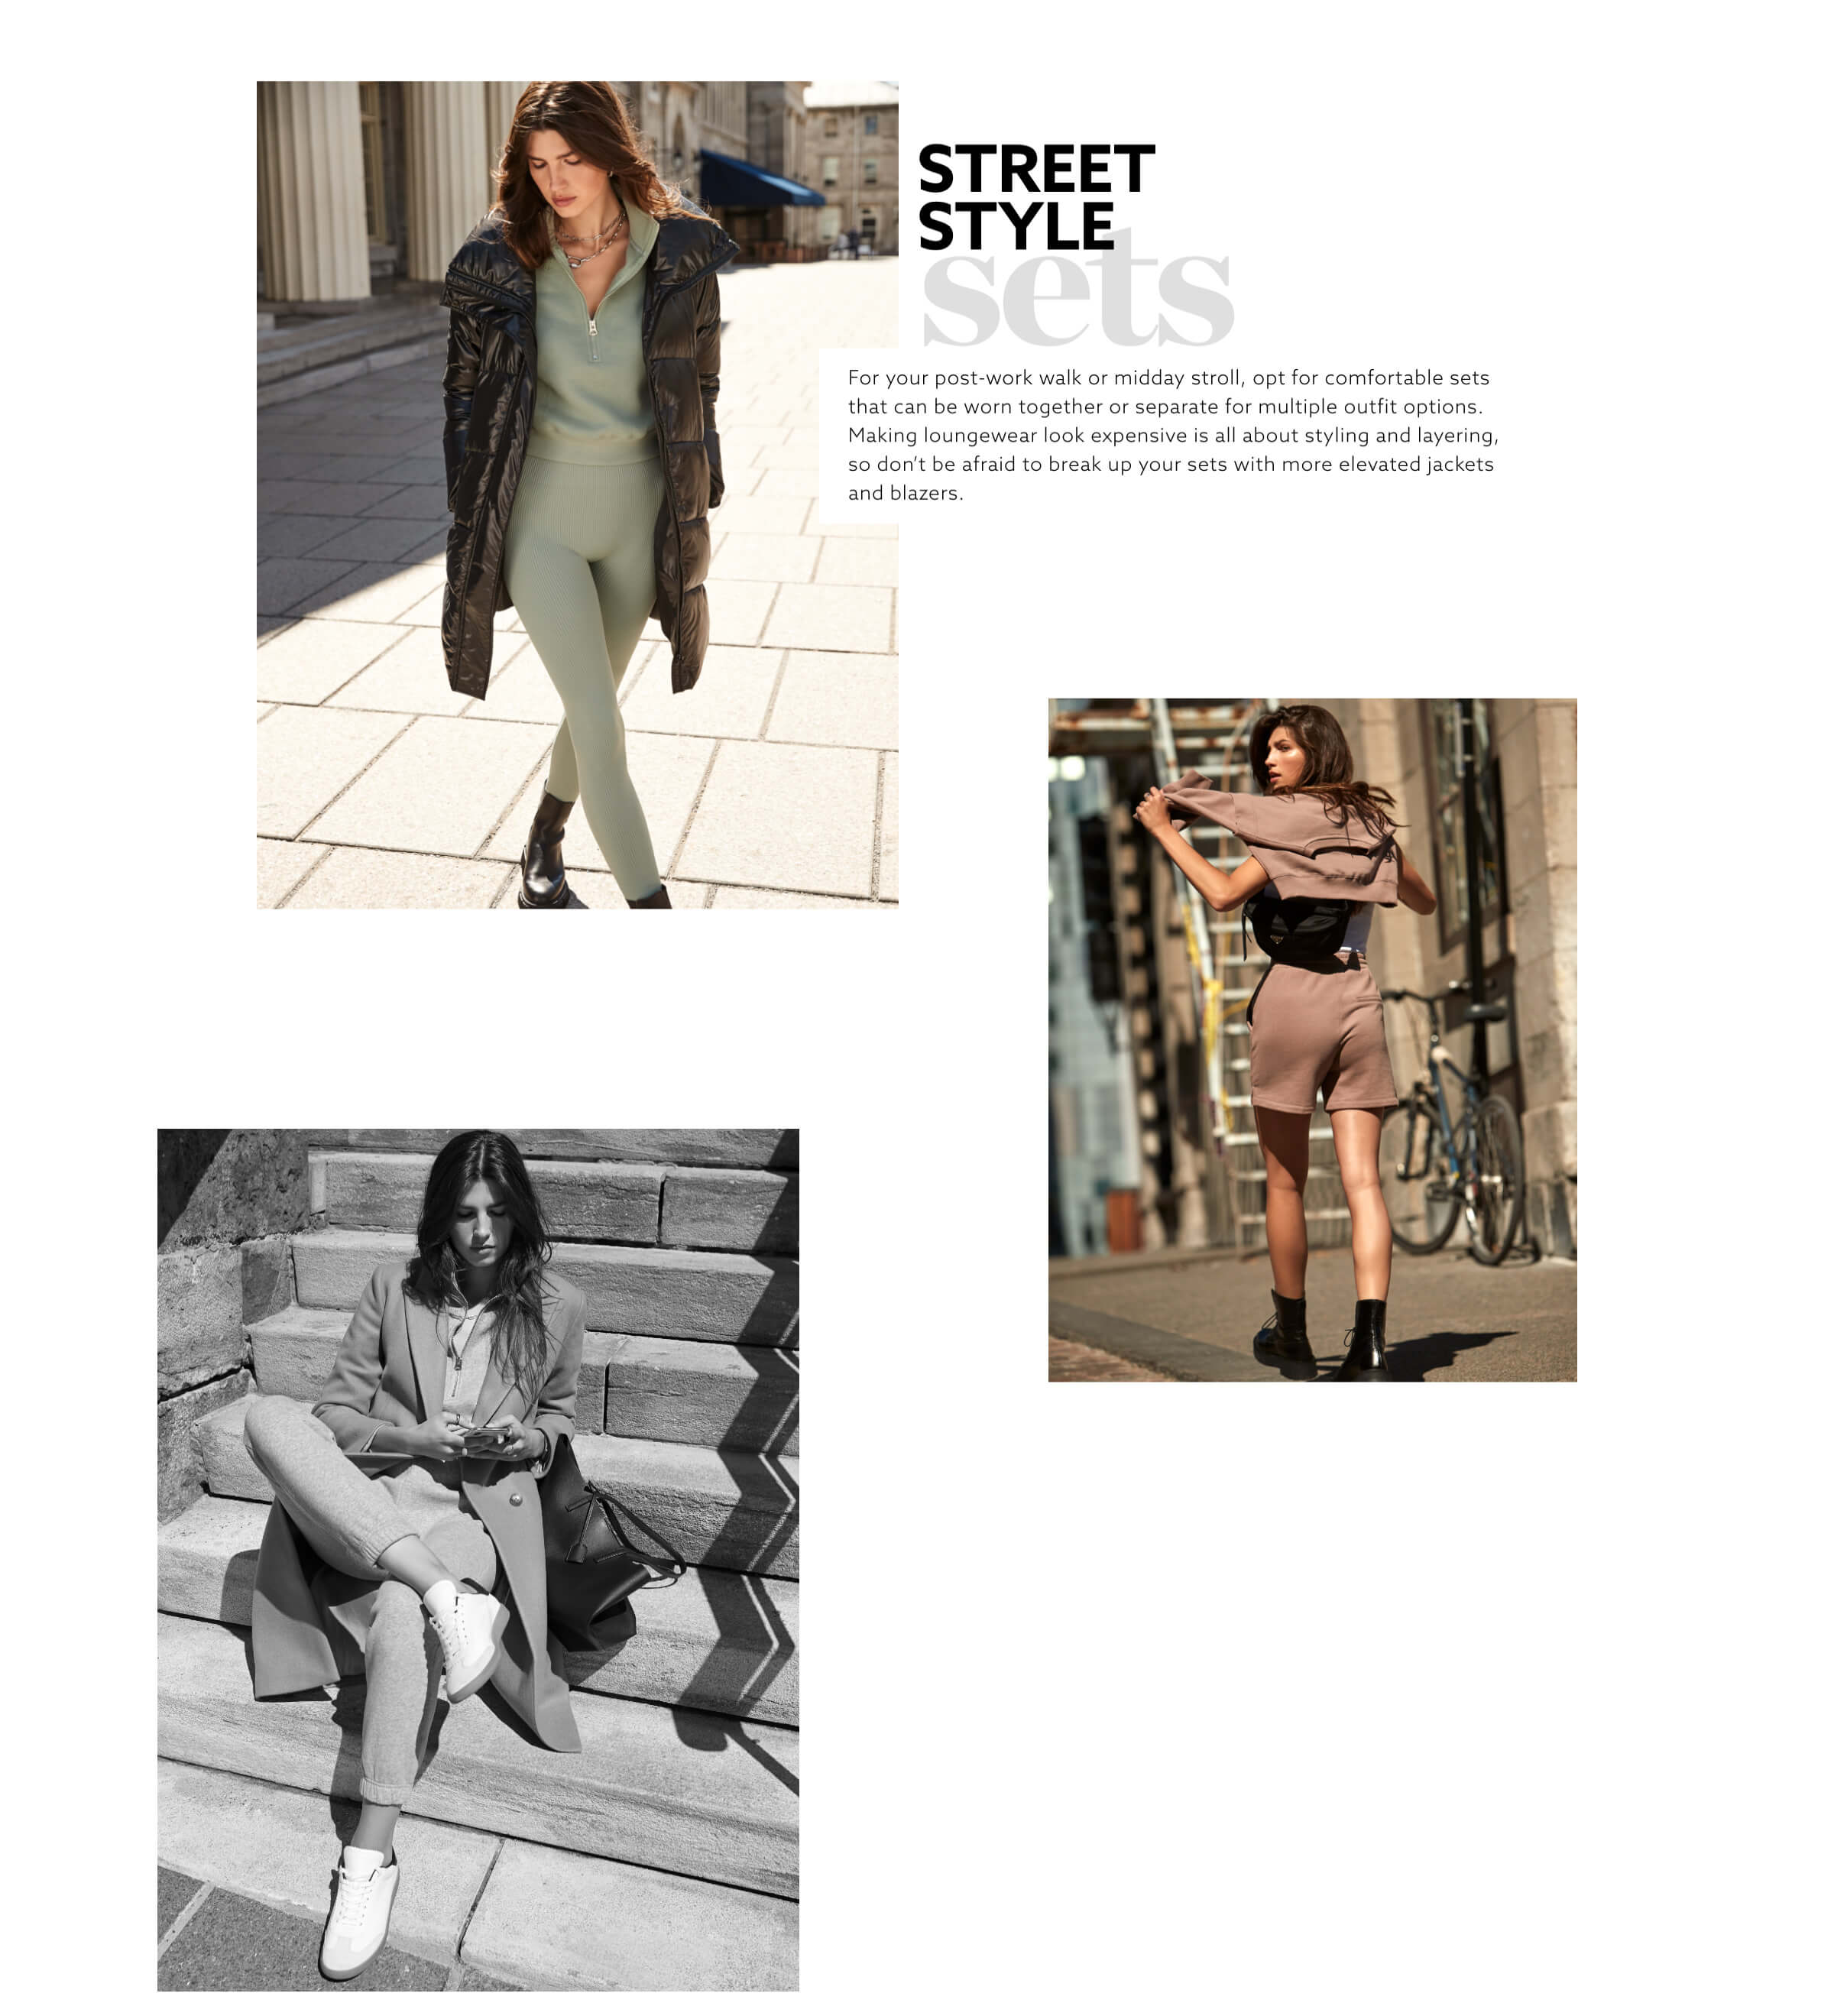 Street style set